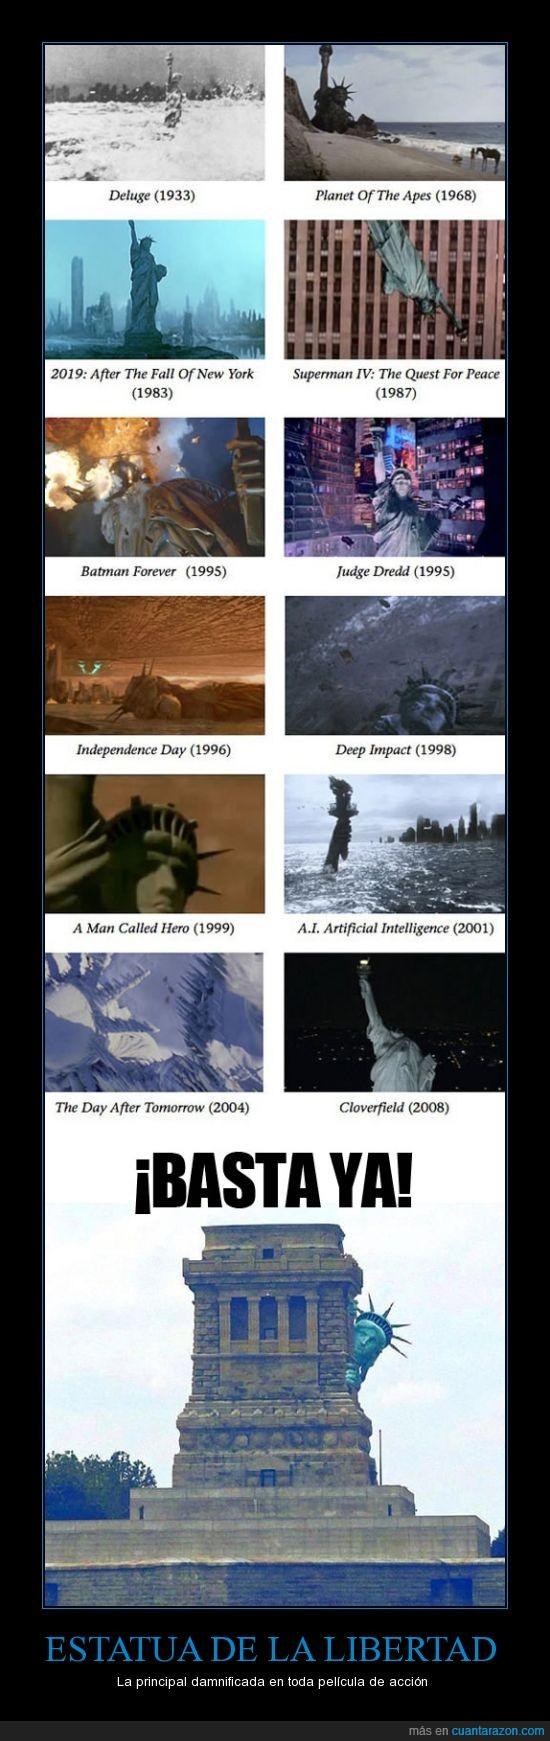 cine,destrozada,estatua de la libertad,películas